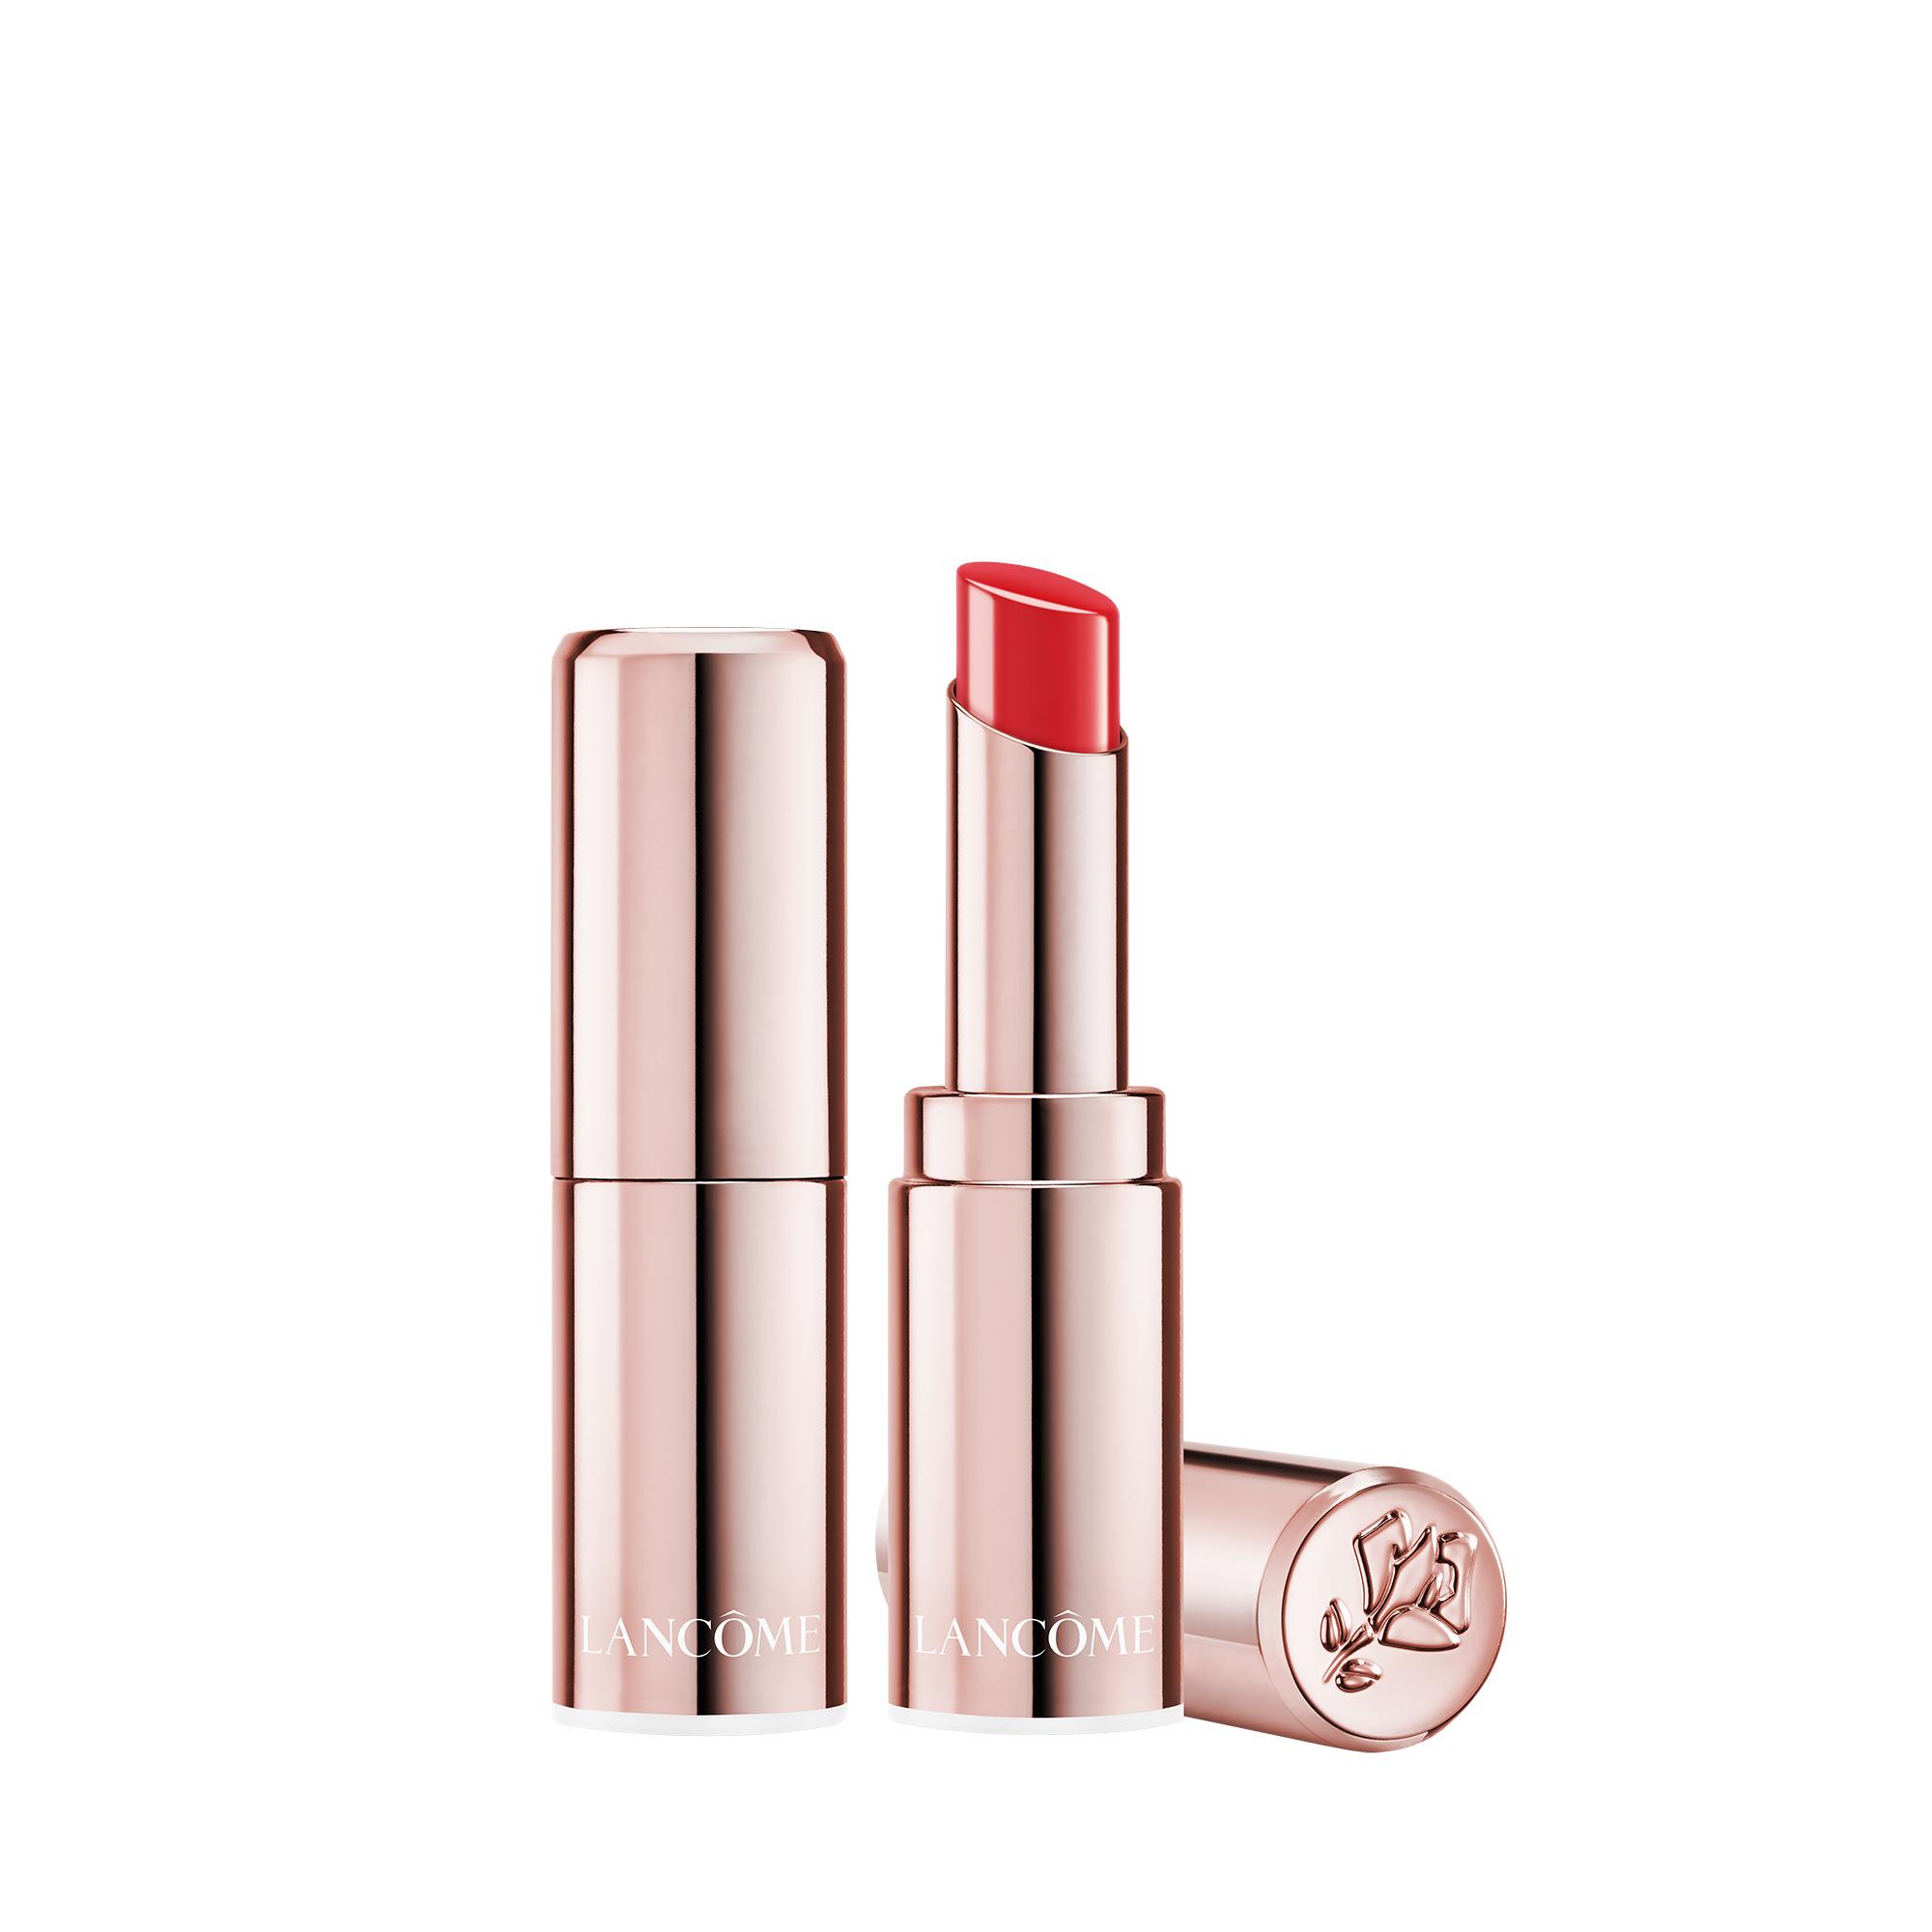 An image of Lancôme L'Absolu Mademoiselle Shine Lipstick - 382 MADEMOISELLE SHINE